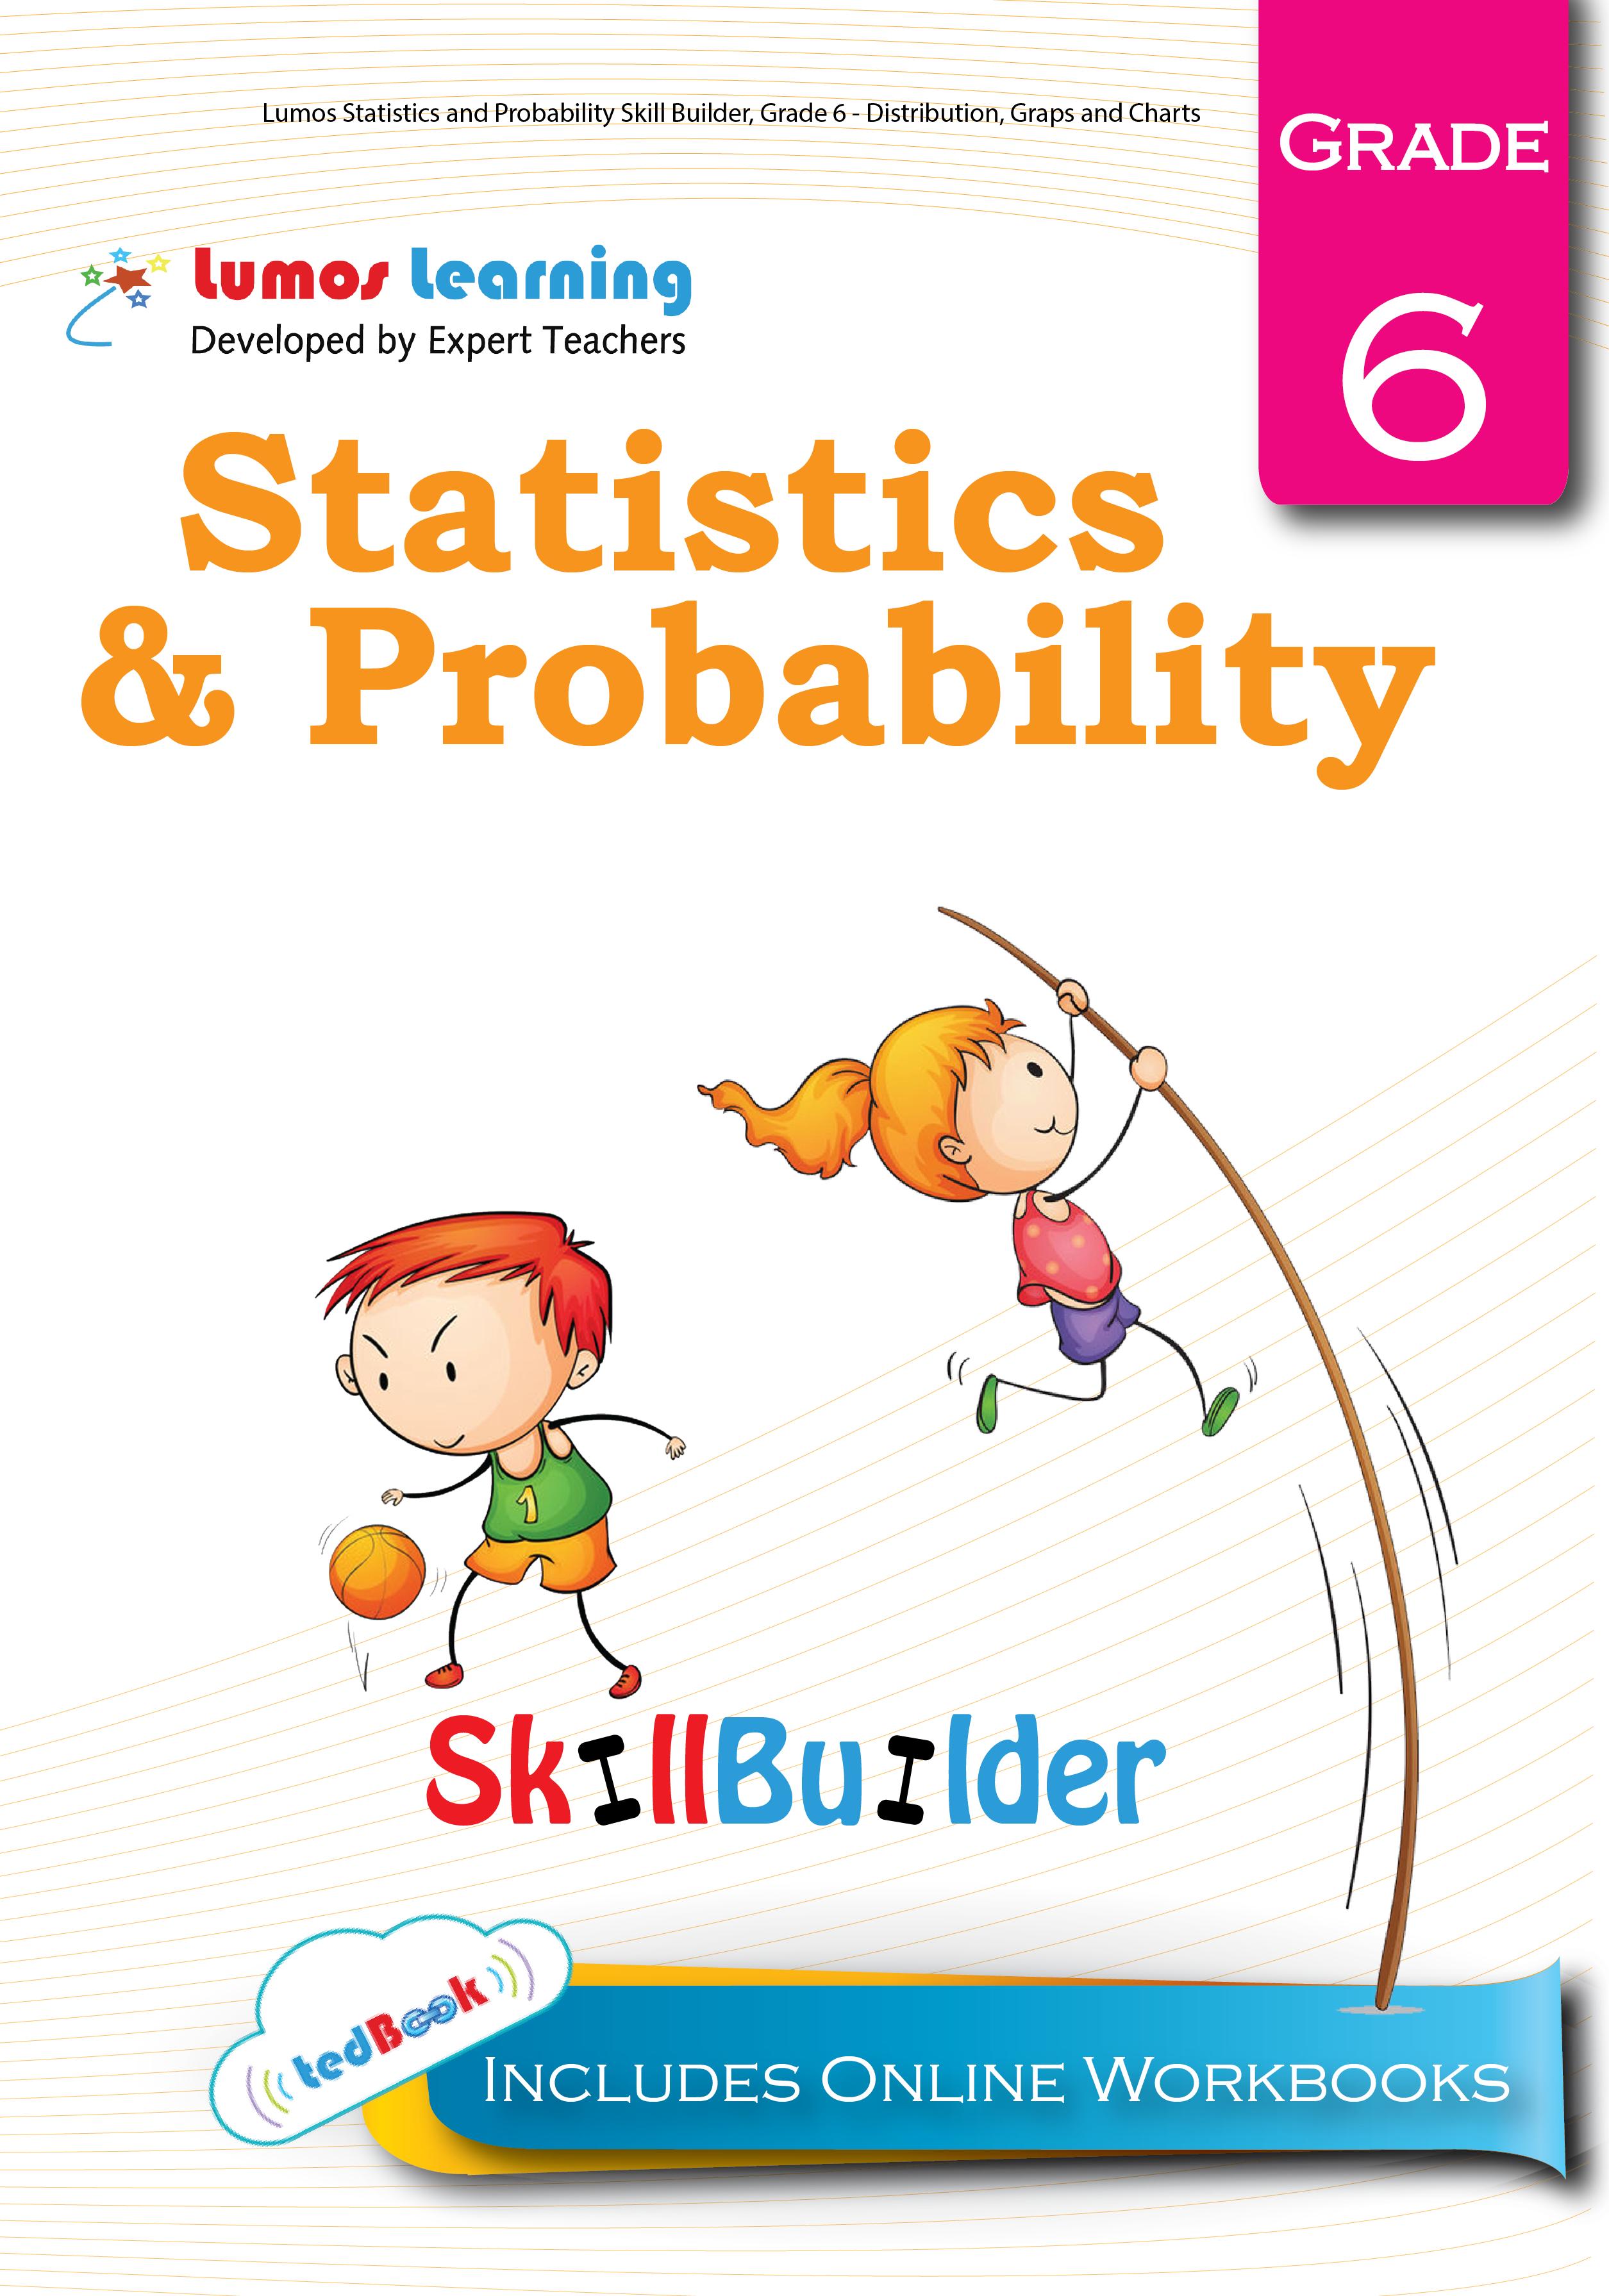 Statistics and Probability grade 6